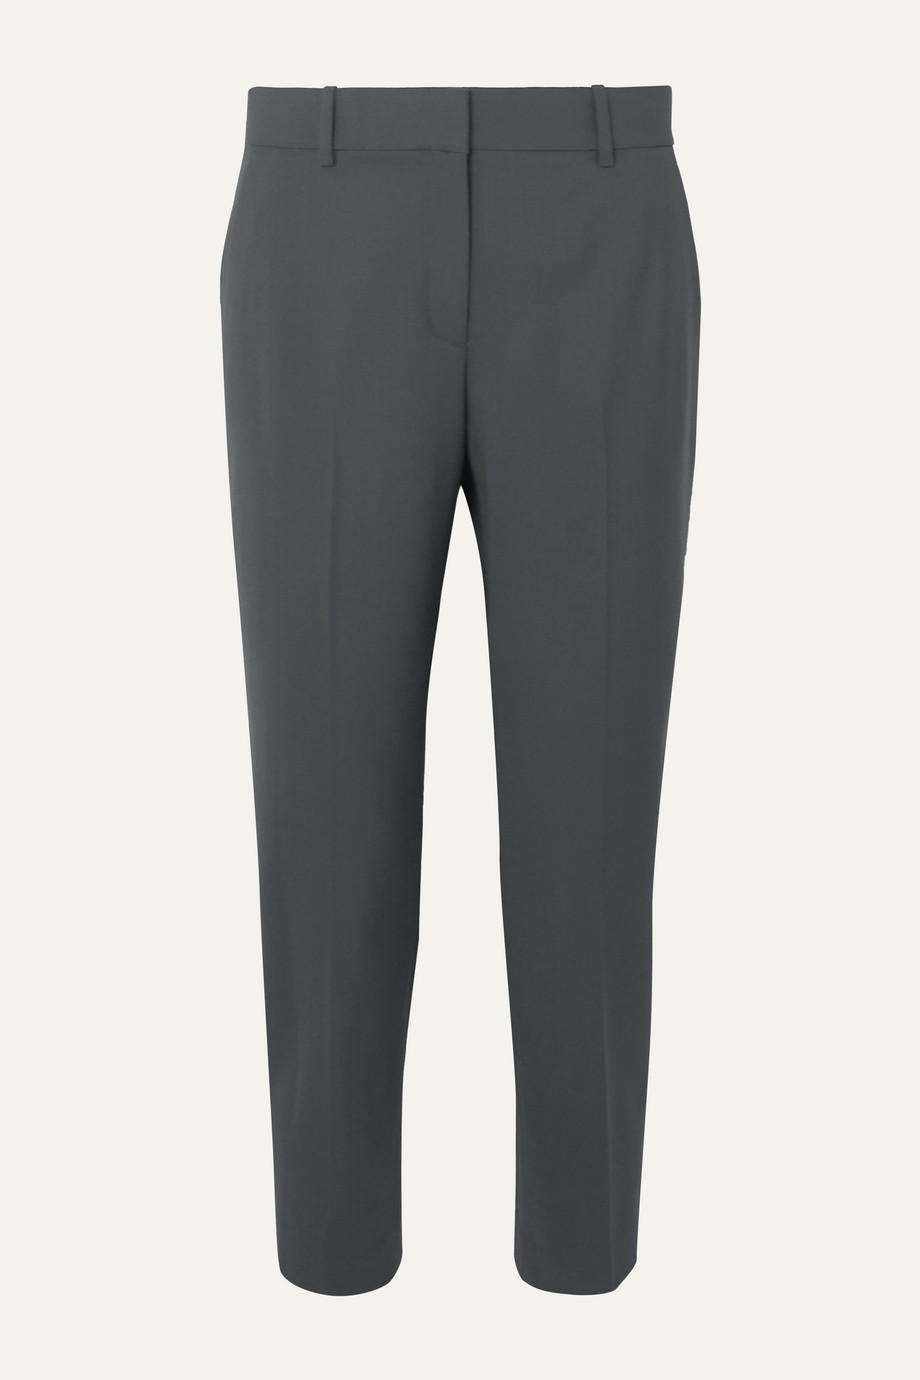 Theory | Treeca stretch-wool tapered pants | NET-A-PORTER.COM